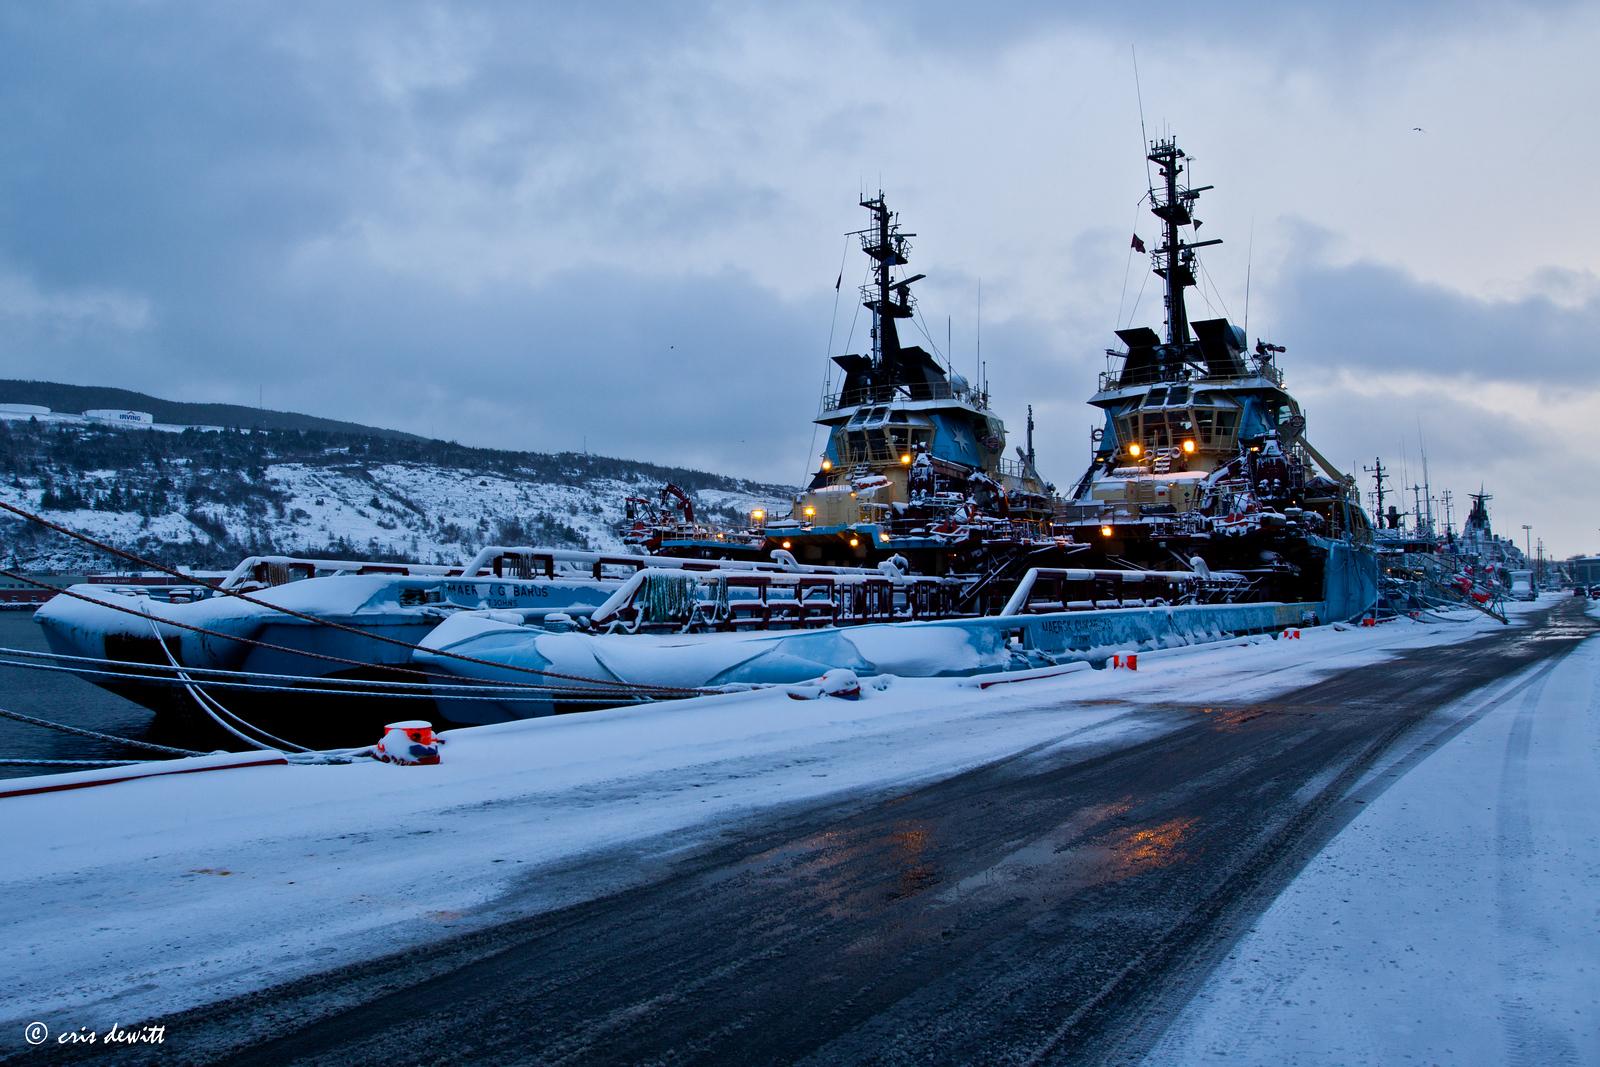 Massive offshore support vessels in St. John, Newfoundland